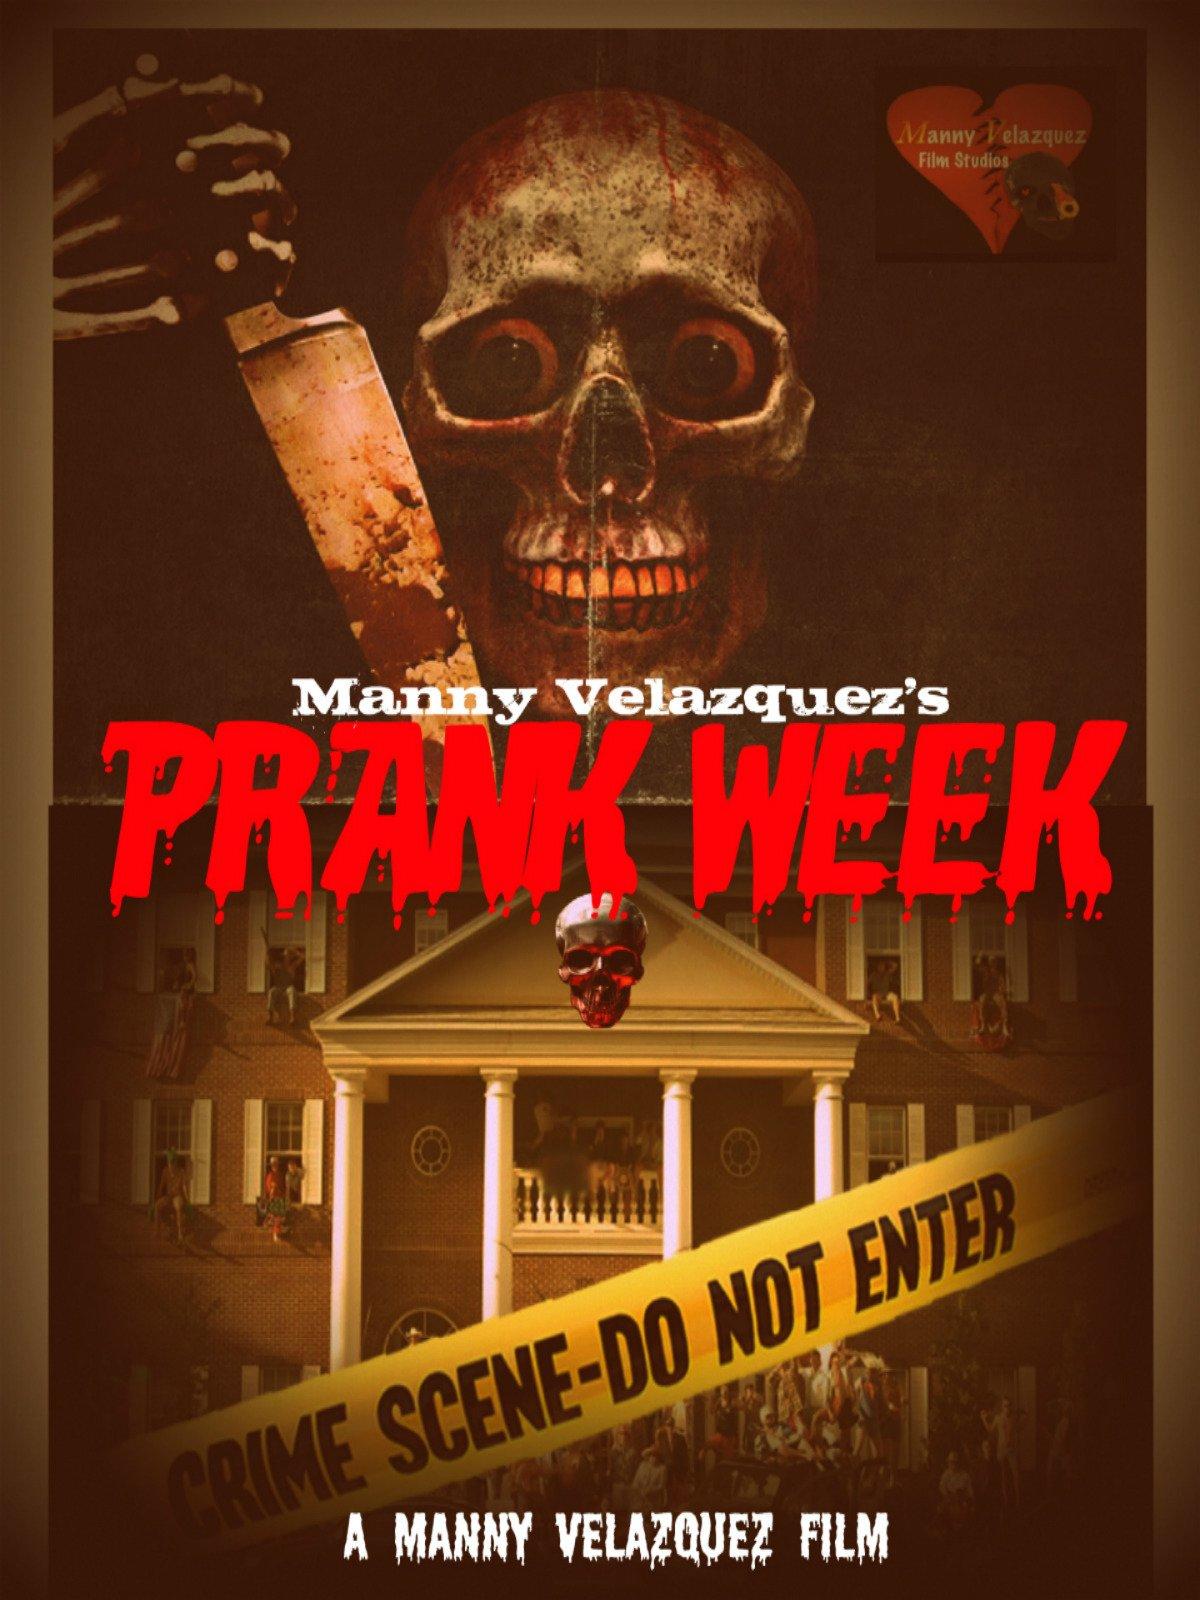 Prank Week